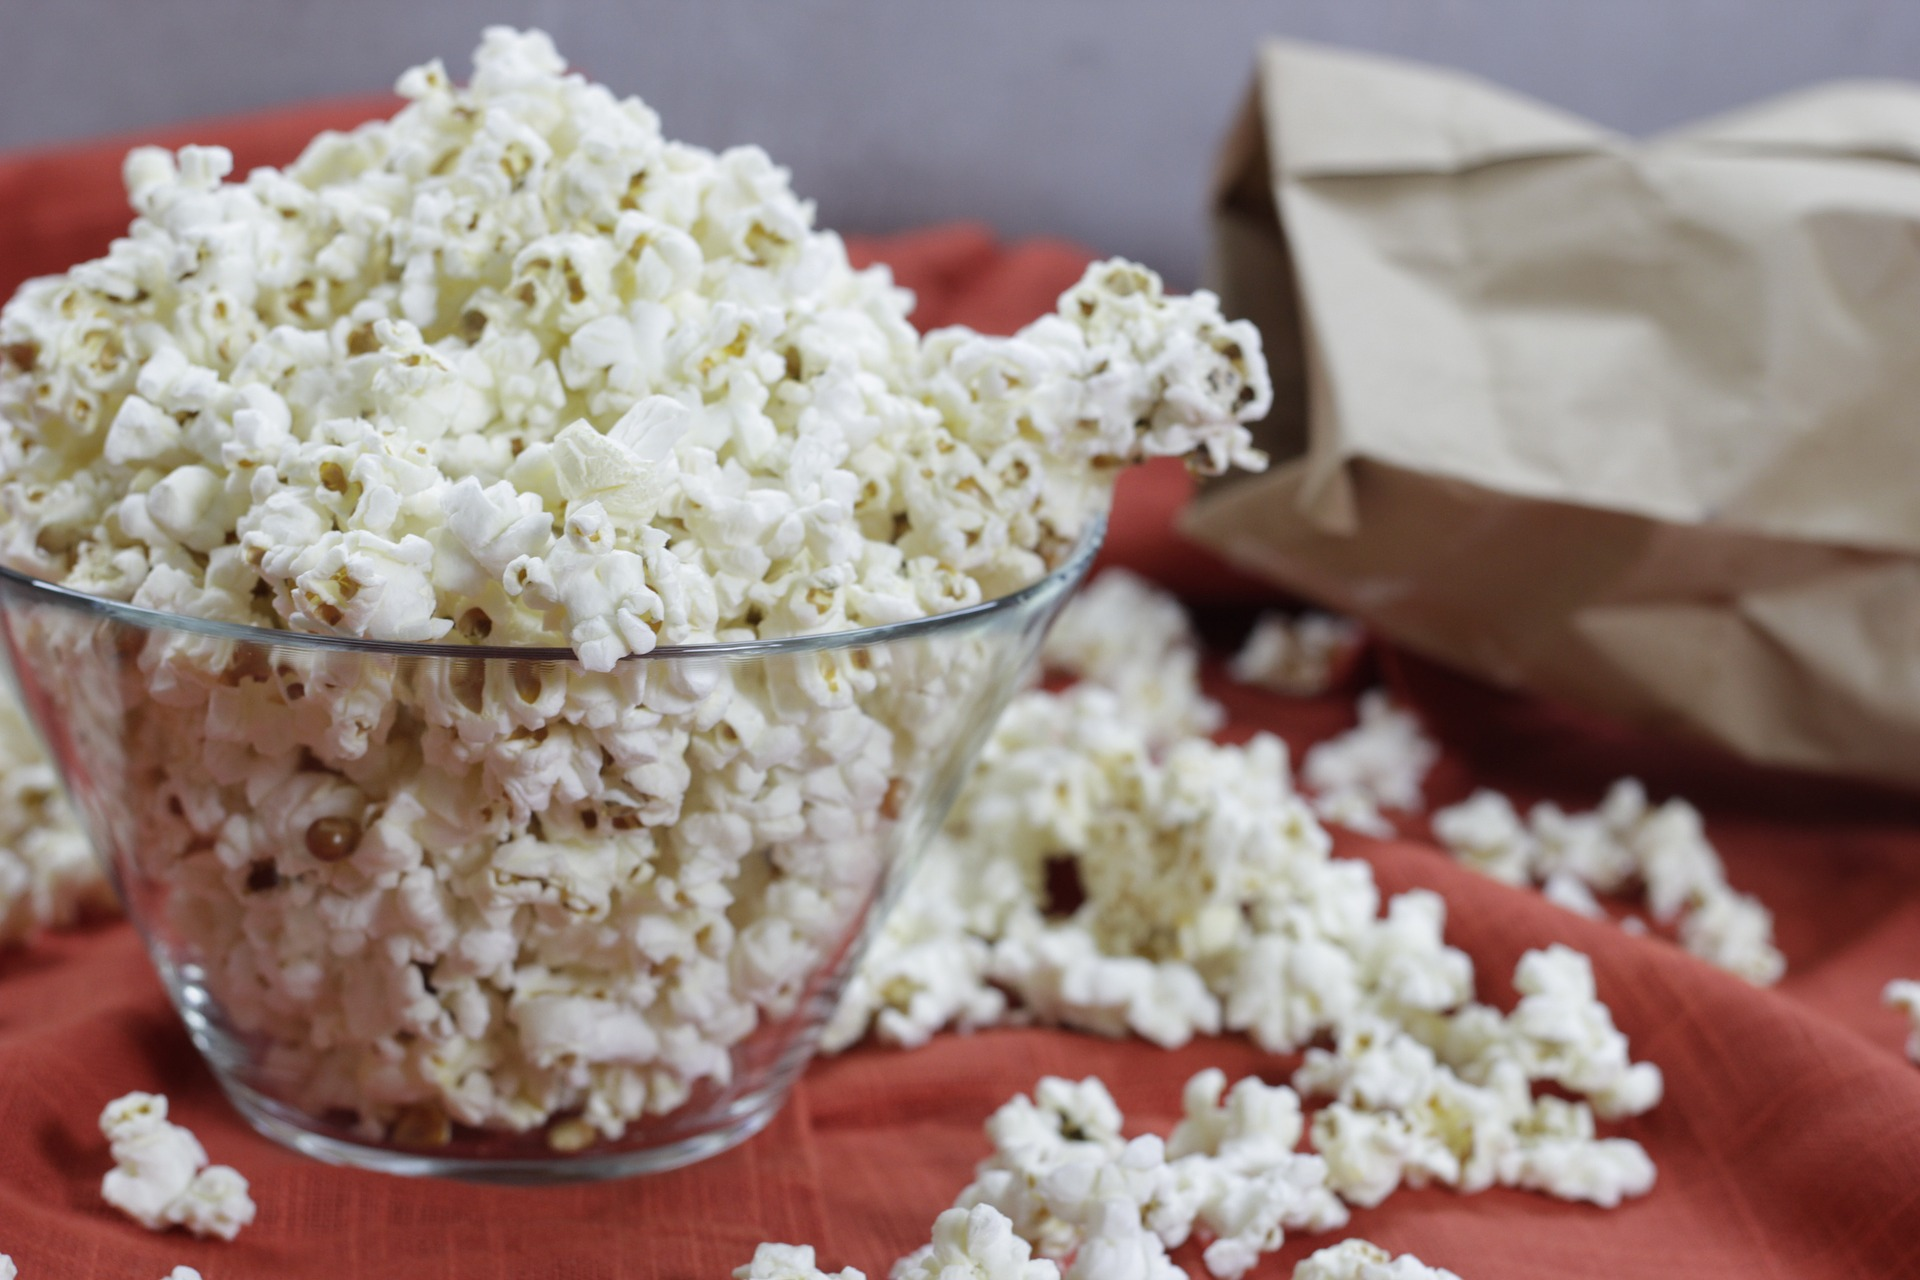 popcorn-782310_1920.jpg